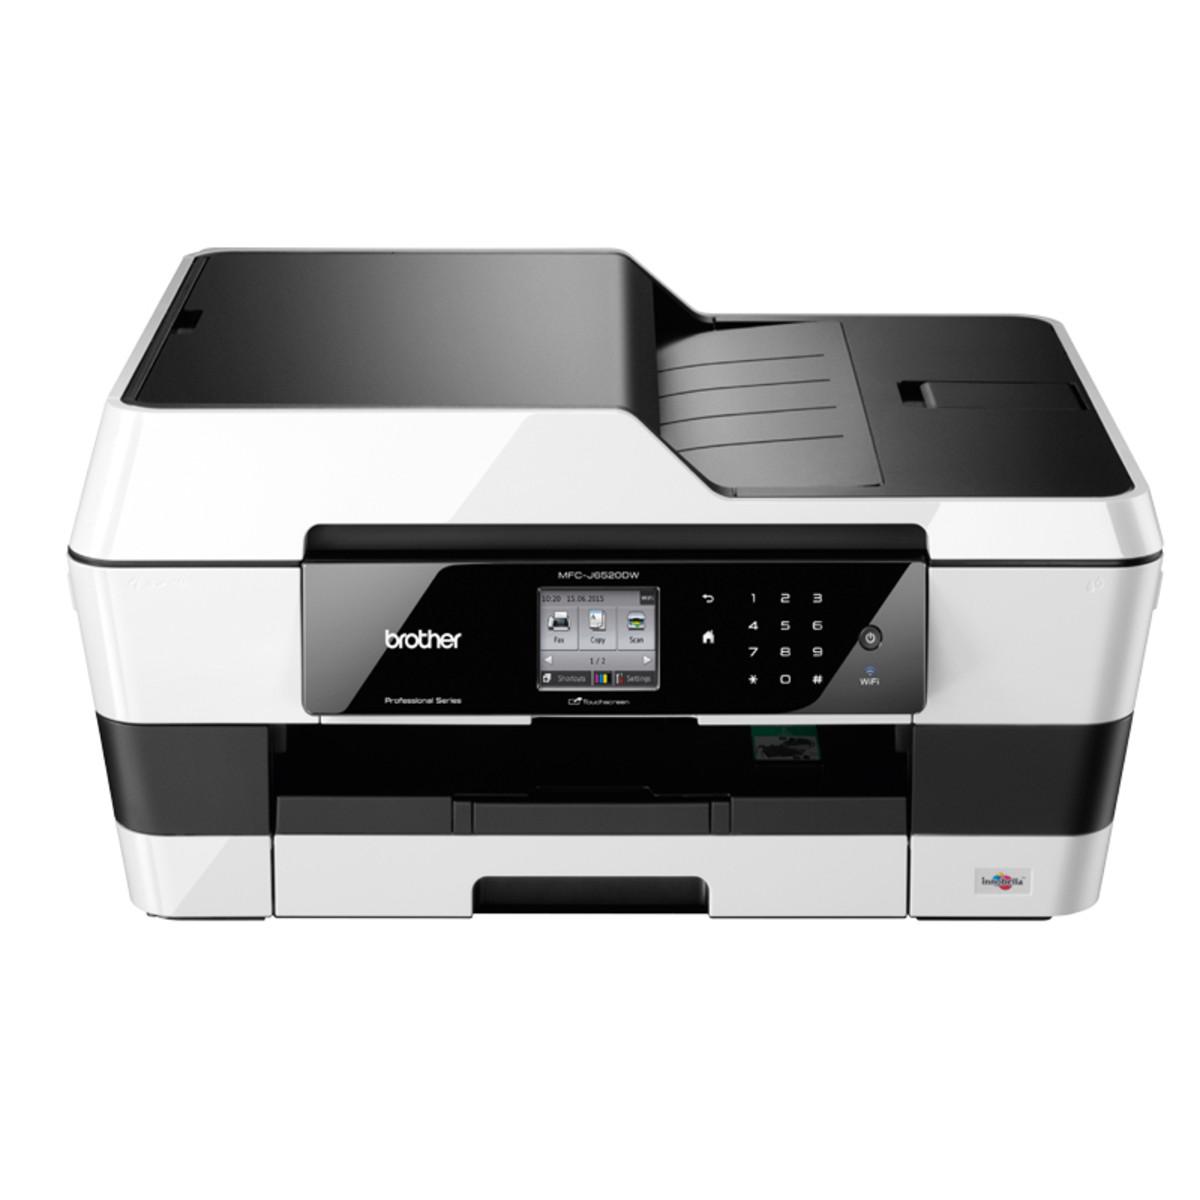 Brother MFC-J6520DW Inkjet Printer